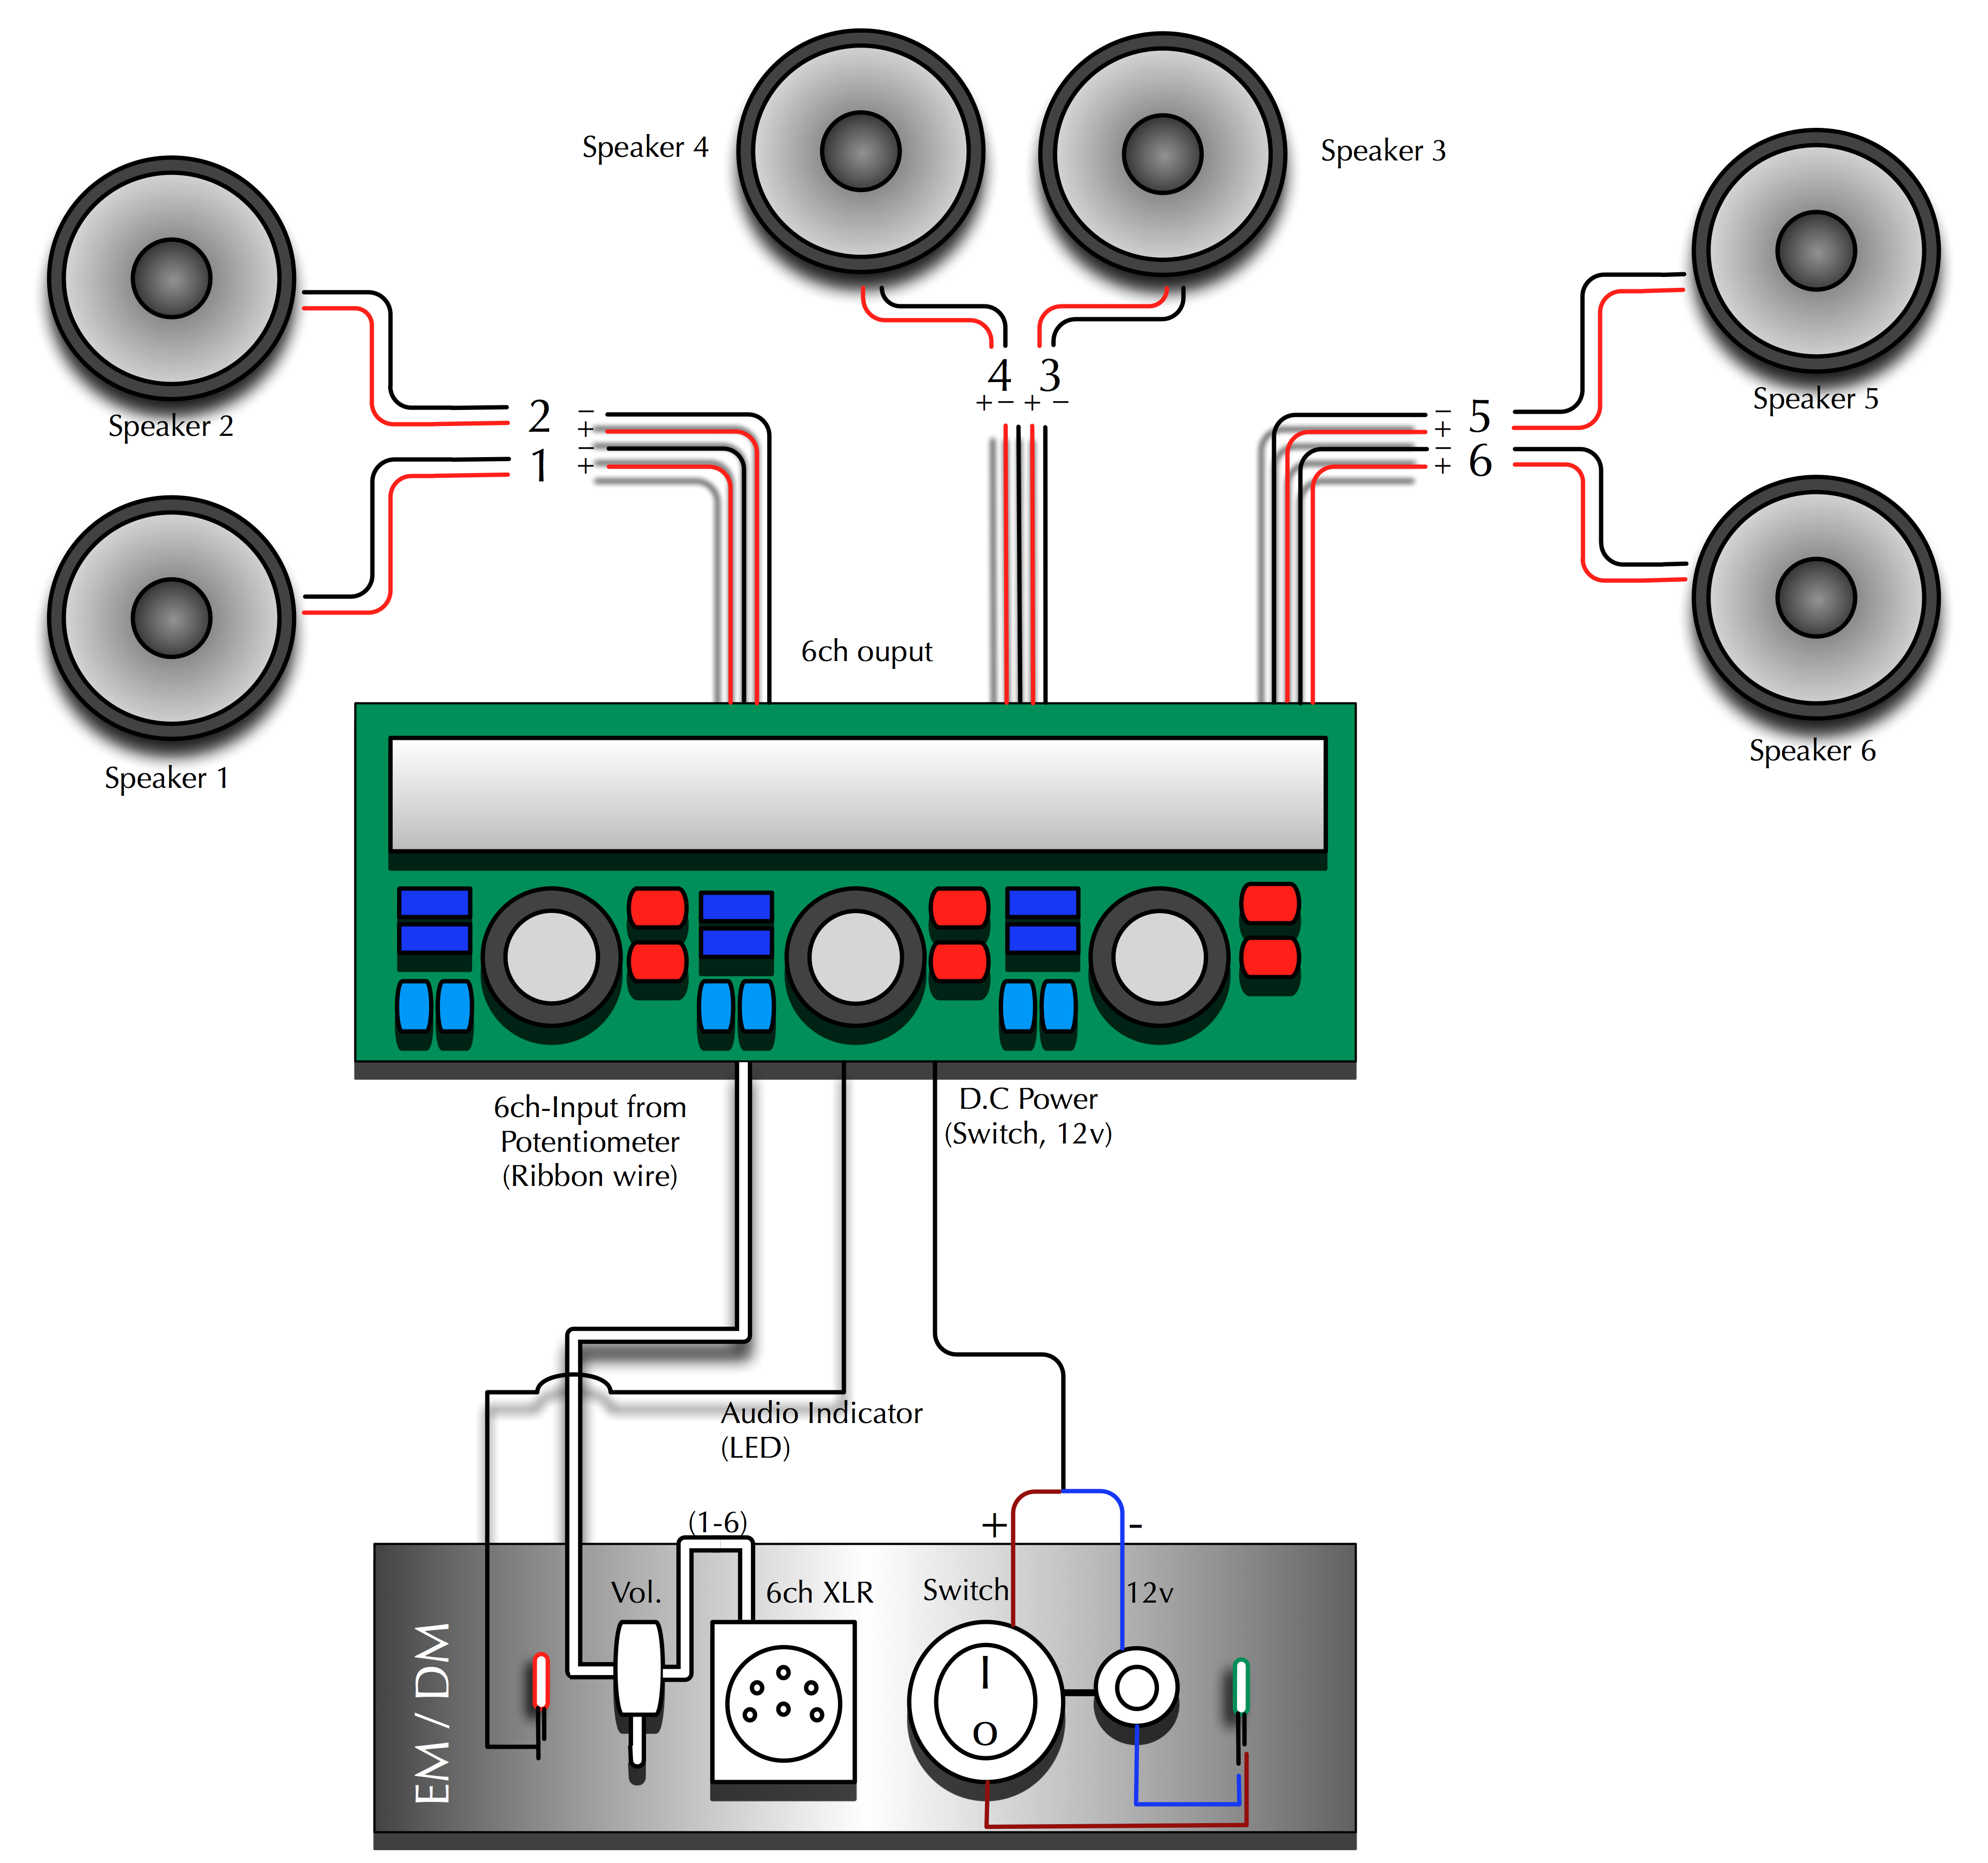 DB_5085] Car Stereo Wiring Diagram 6 Speakers Wiring DiagramRicis Mecad Egre Opein Mohammedshrine Librar Wiring 101